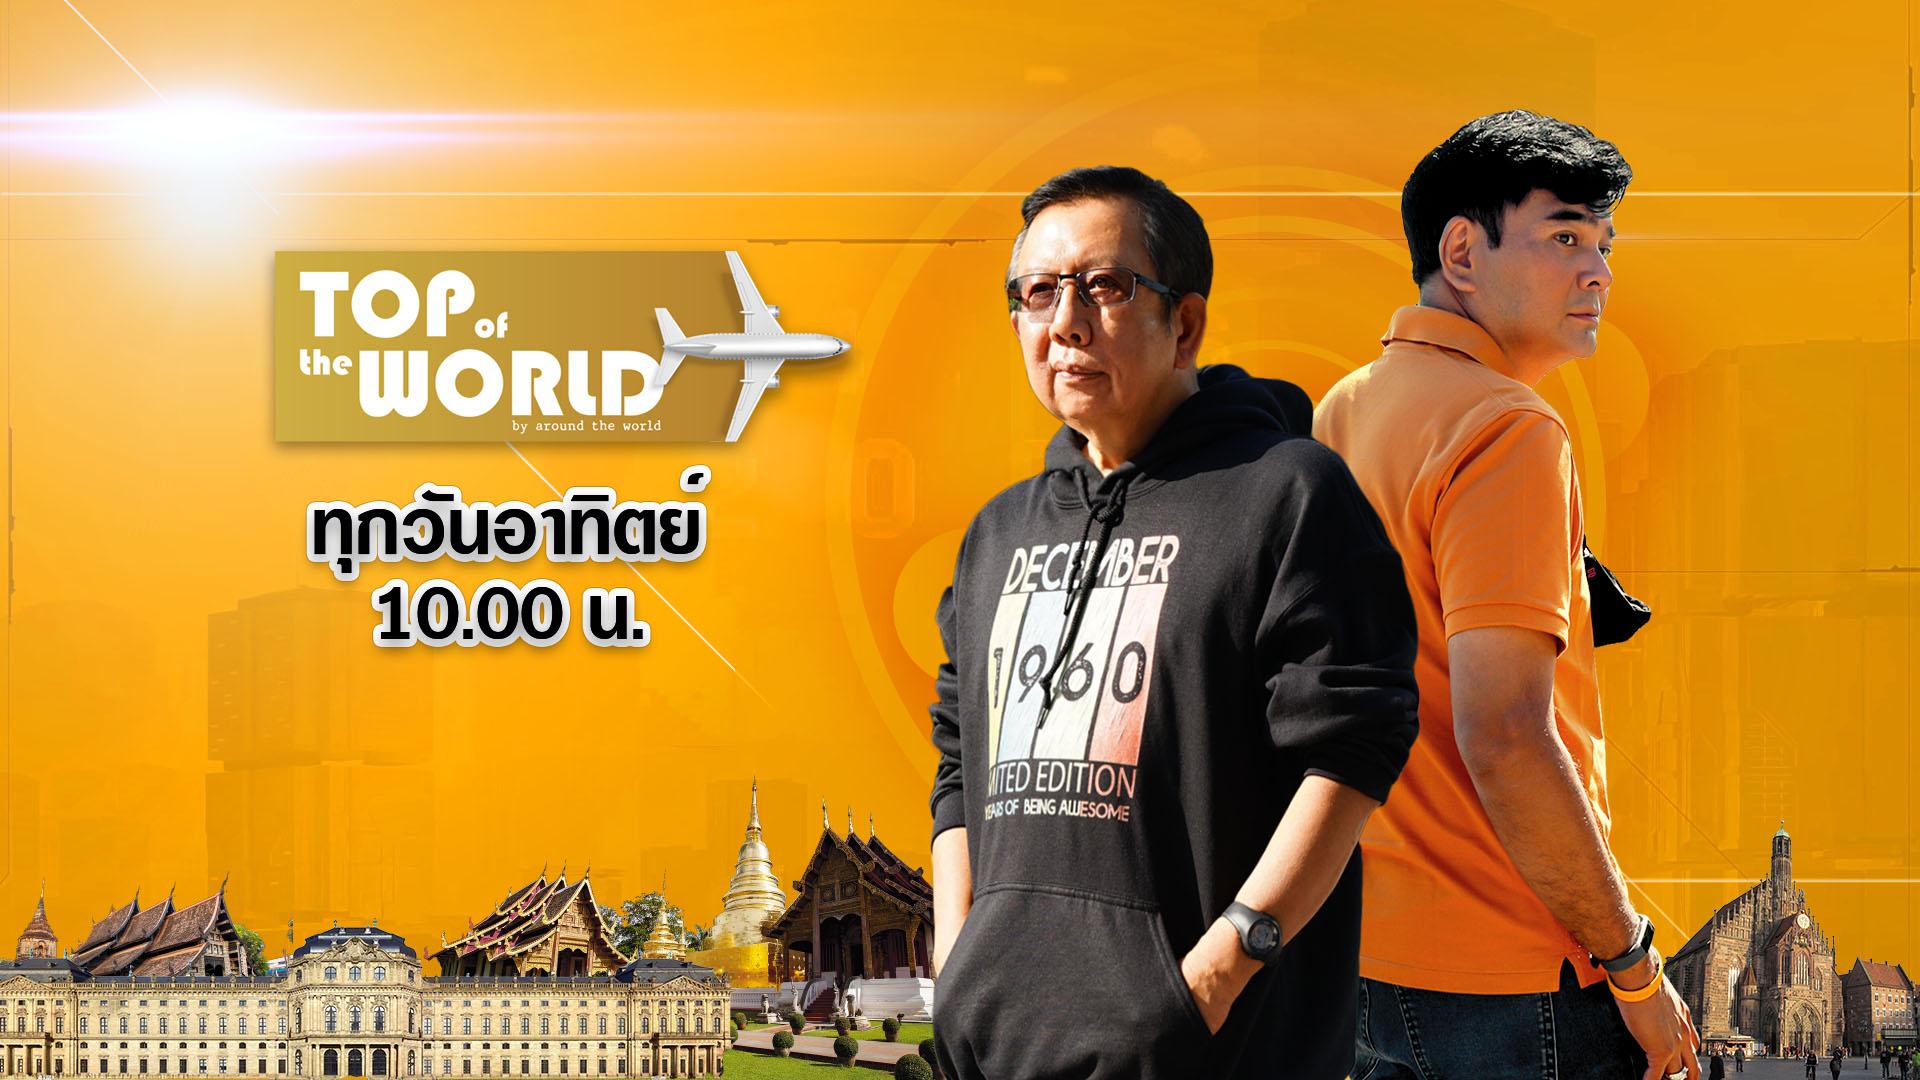 TOP OF THE WORLD  | 20 มิถุนายน 2564